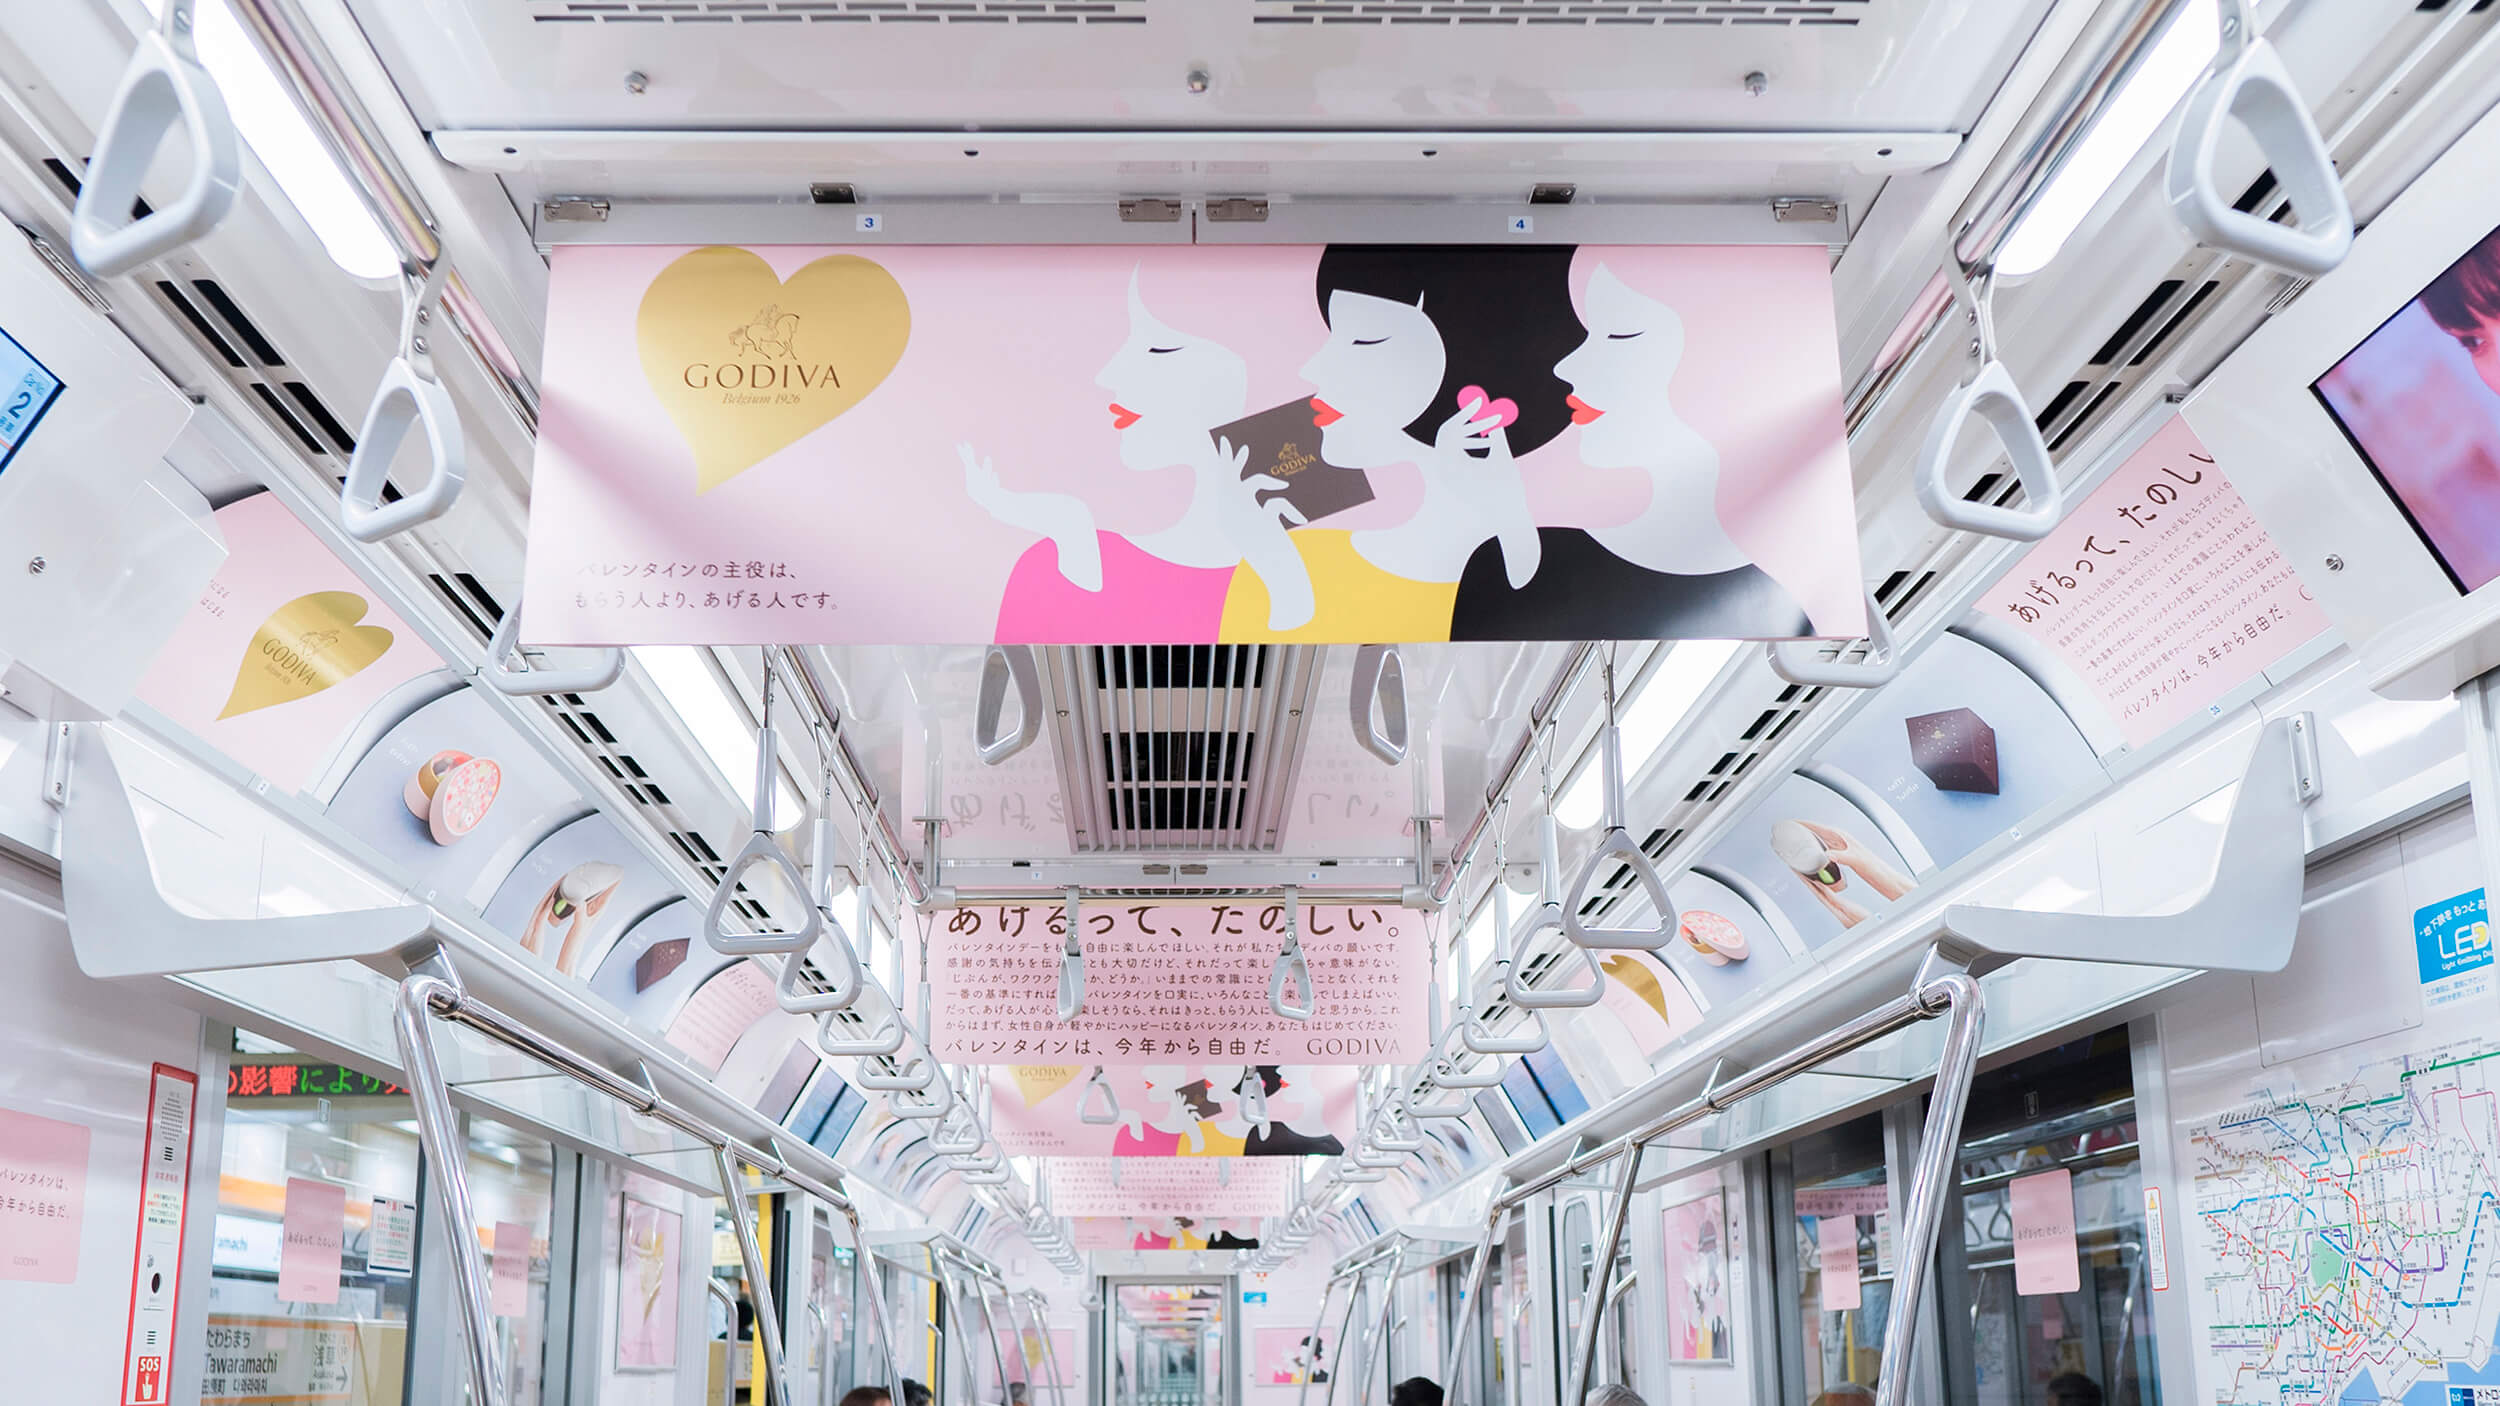 godiva_subway_2500_min.jpg